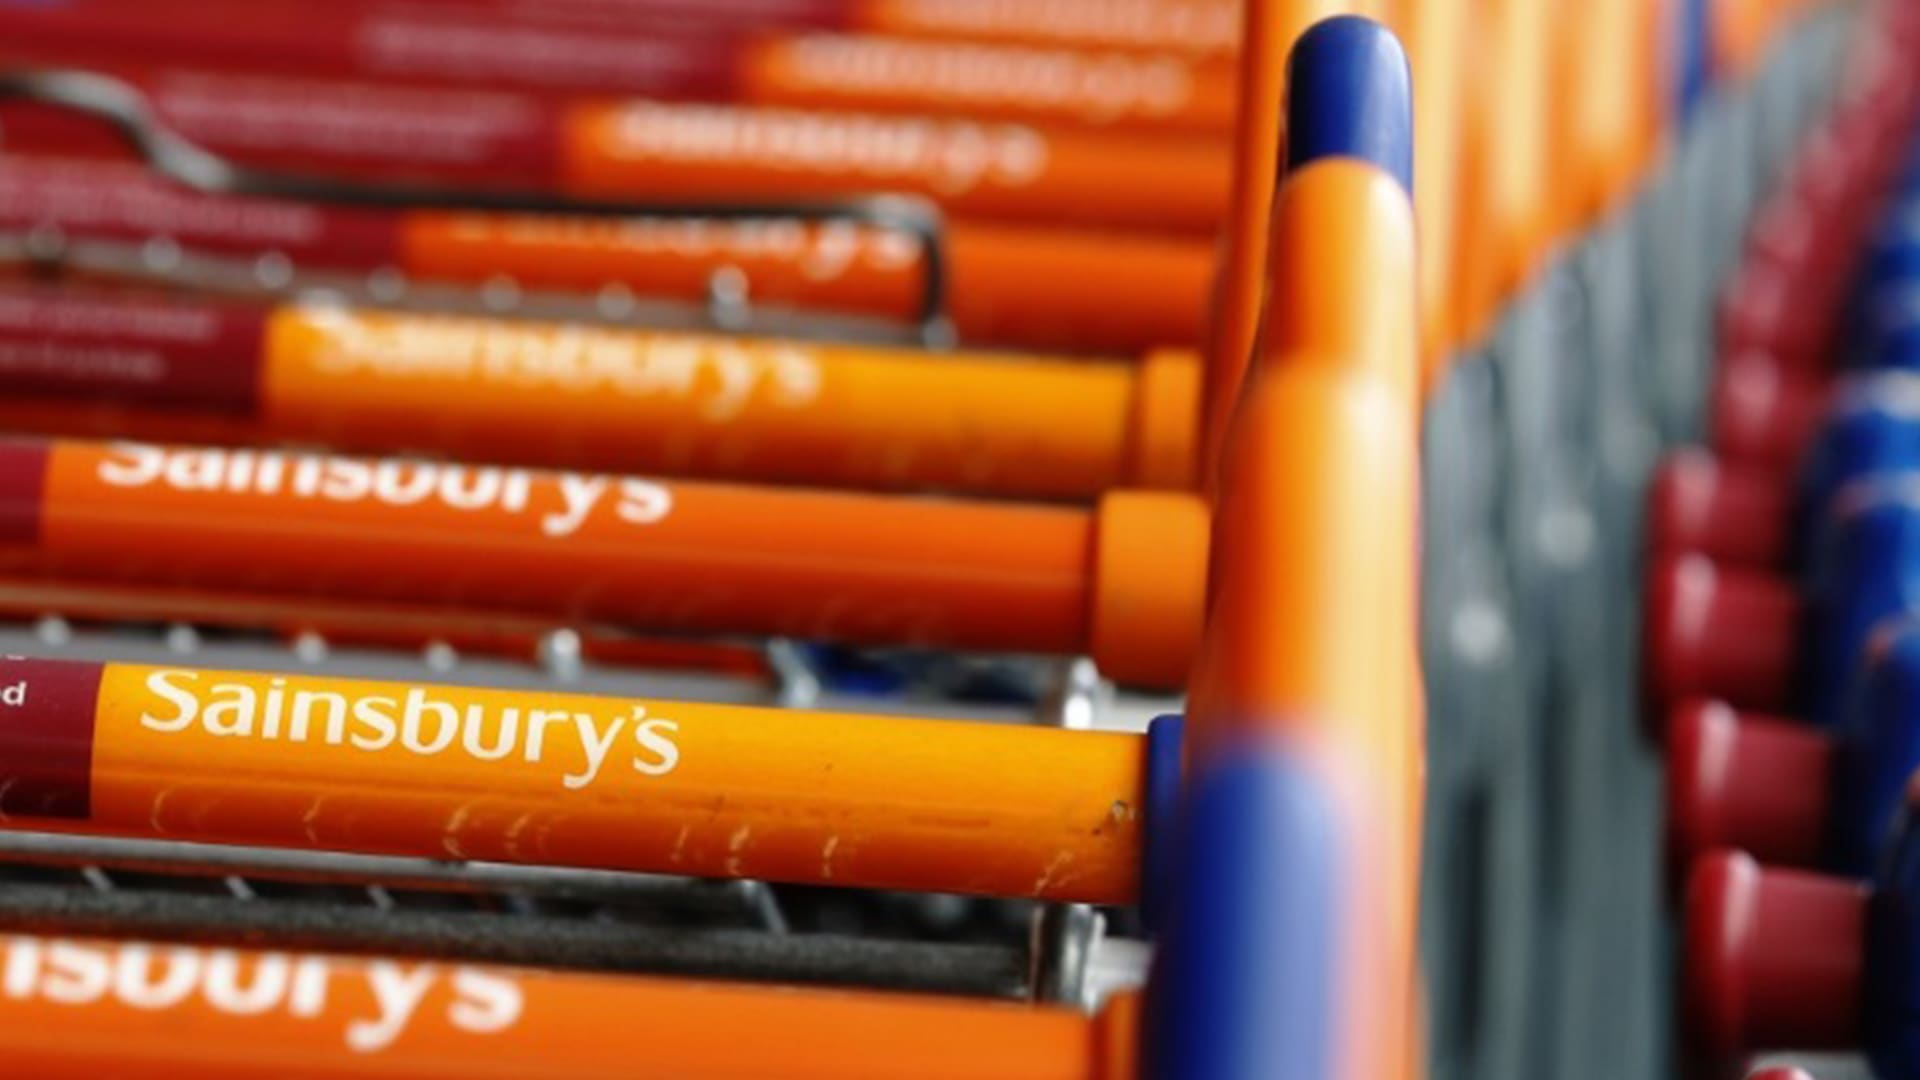 Sainsburys announce their new multichannel grocery platform